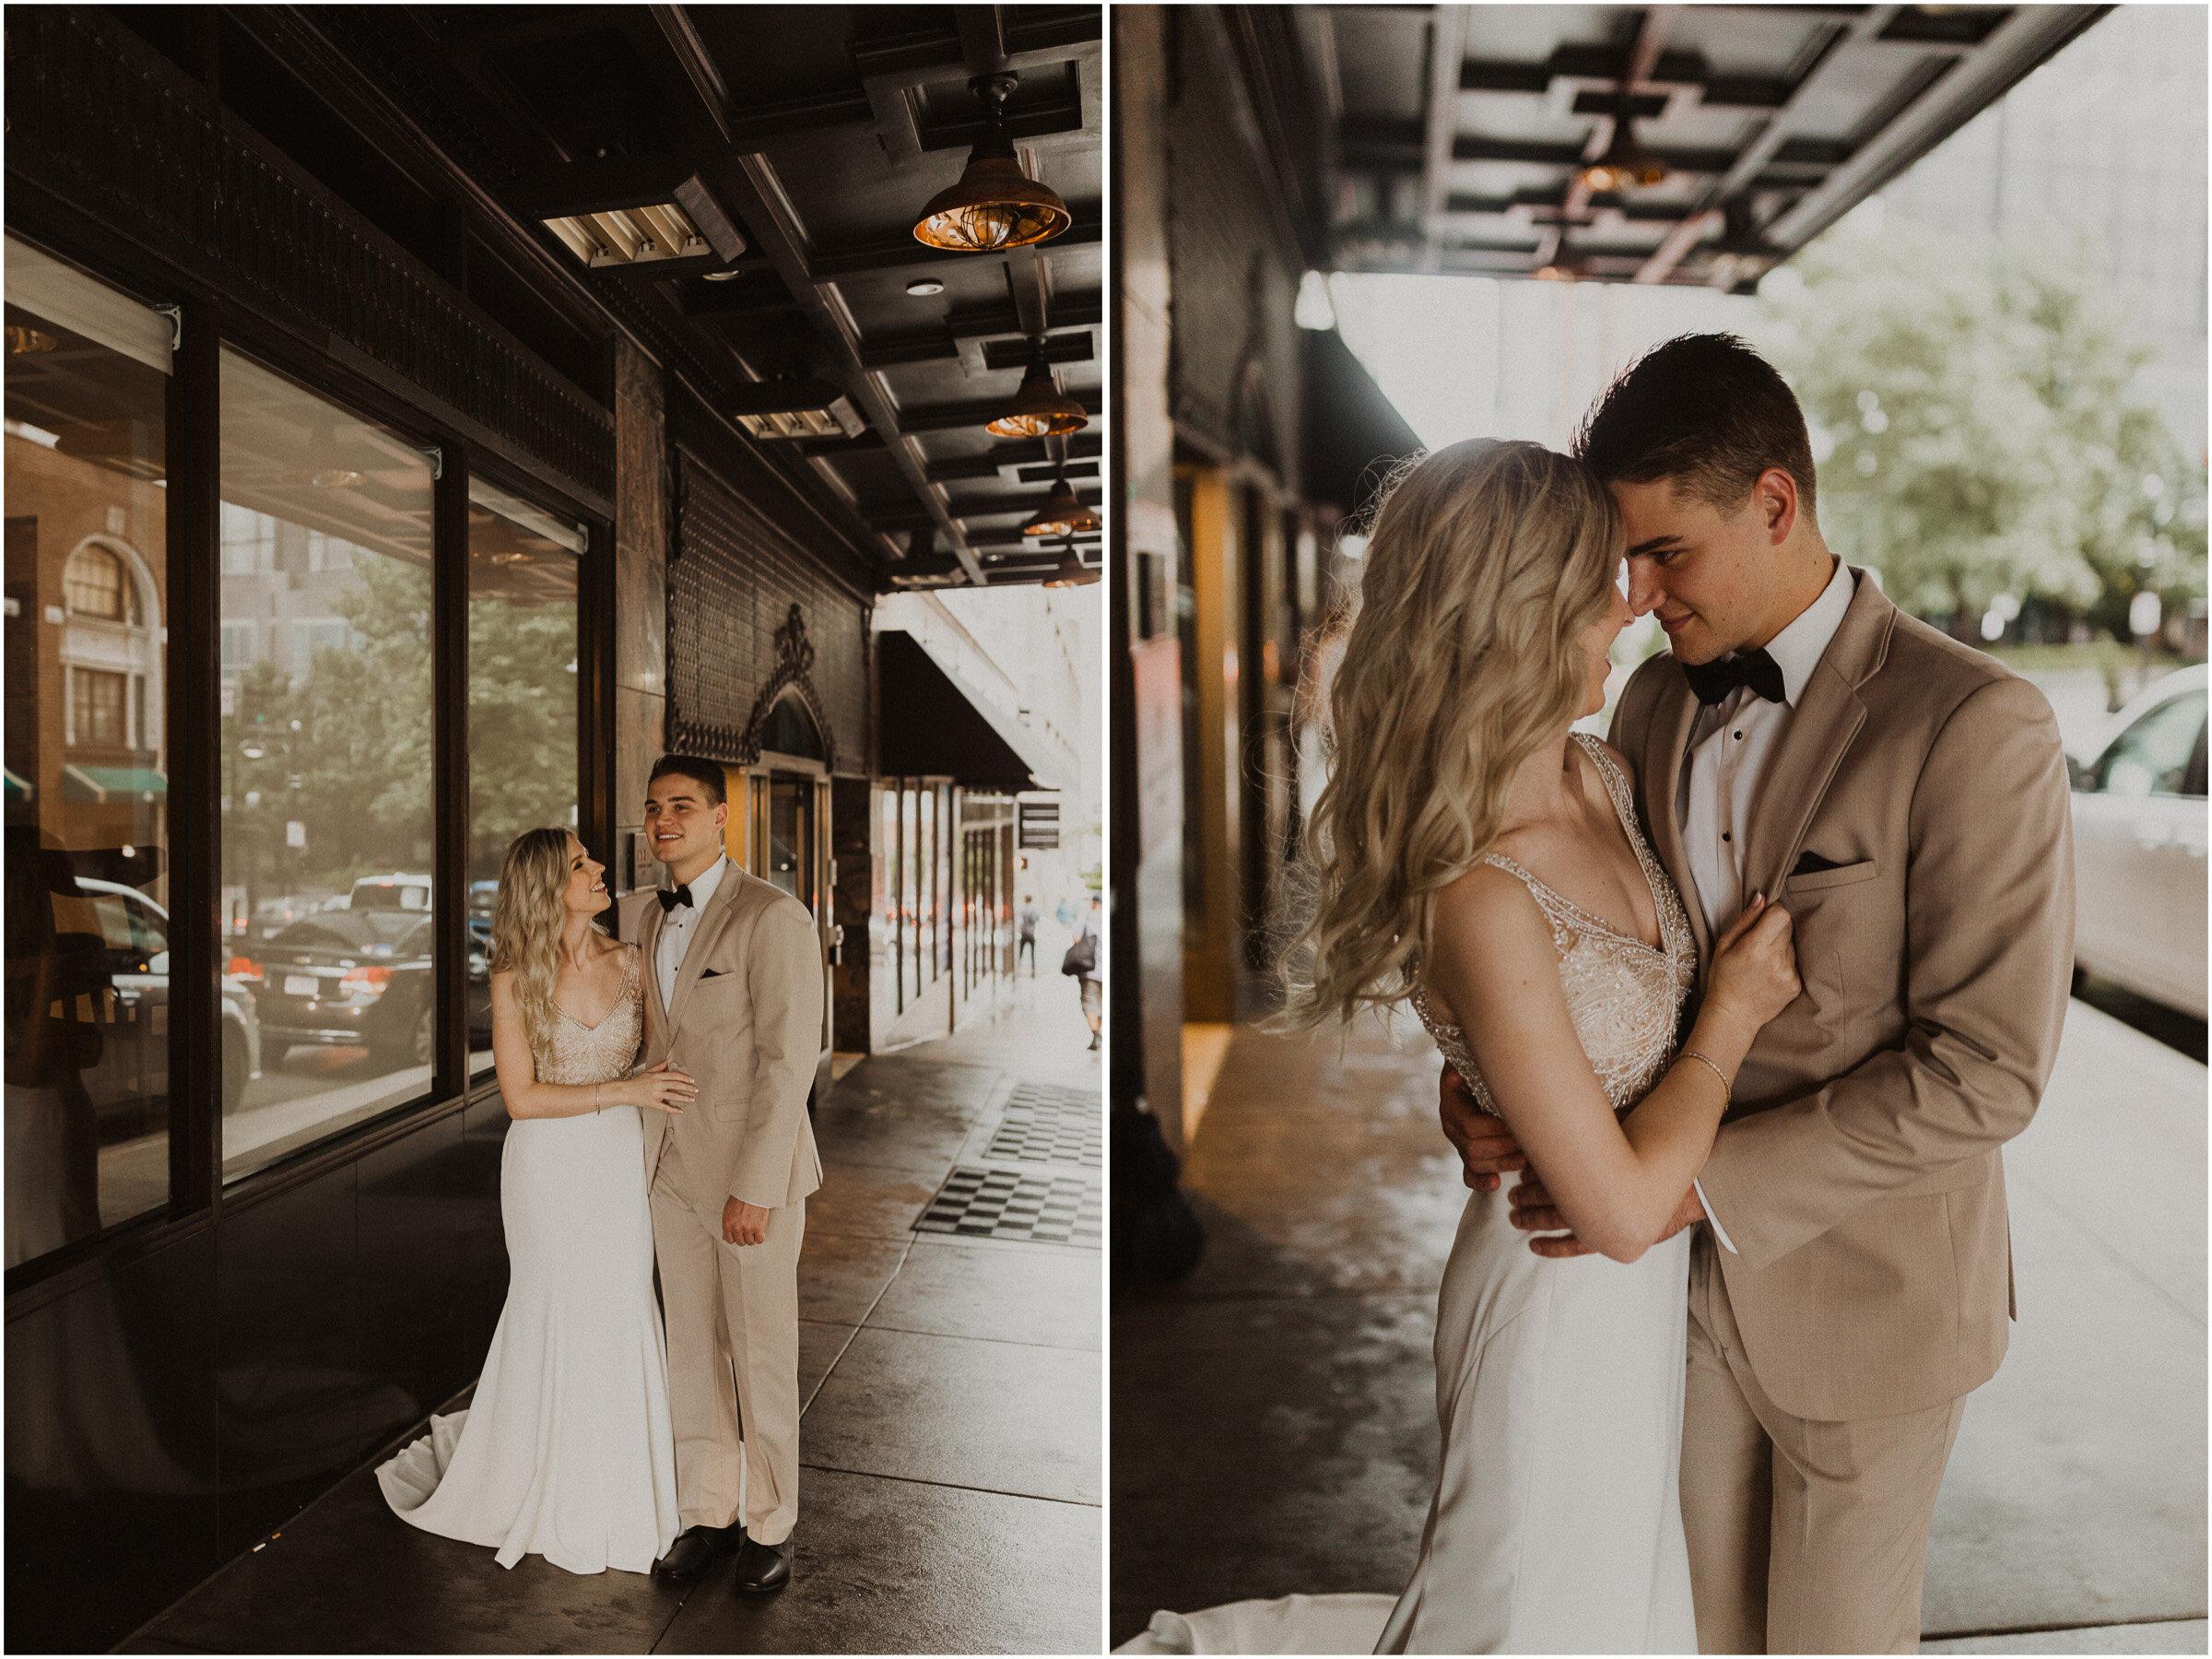 alyssa barletter photography downtown kansas city wedding boulevard brewery reception rainy day wedding-23.jpg